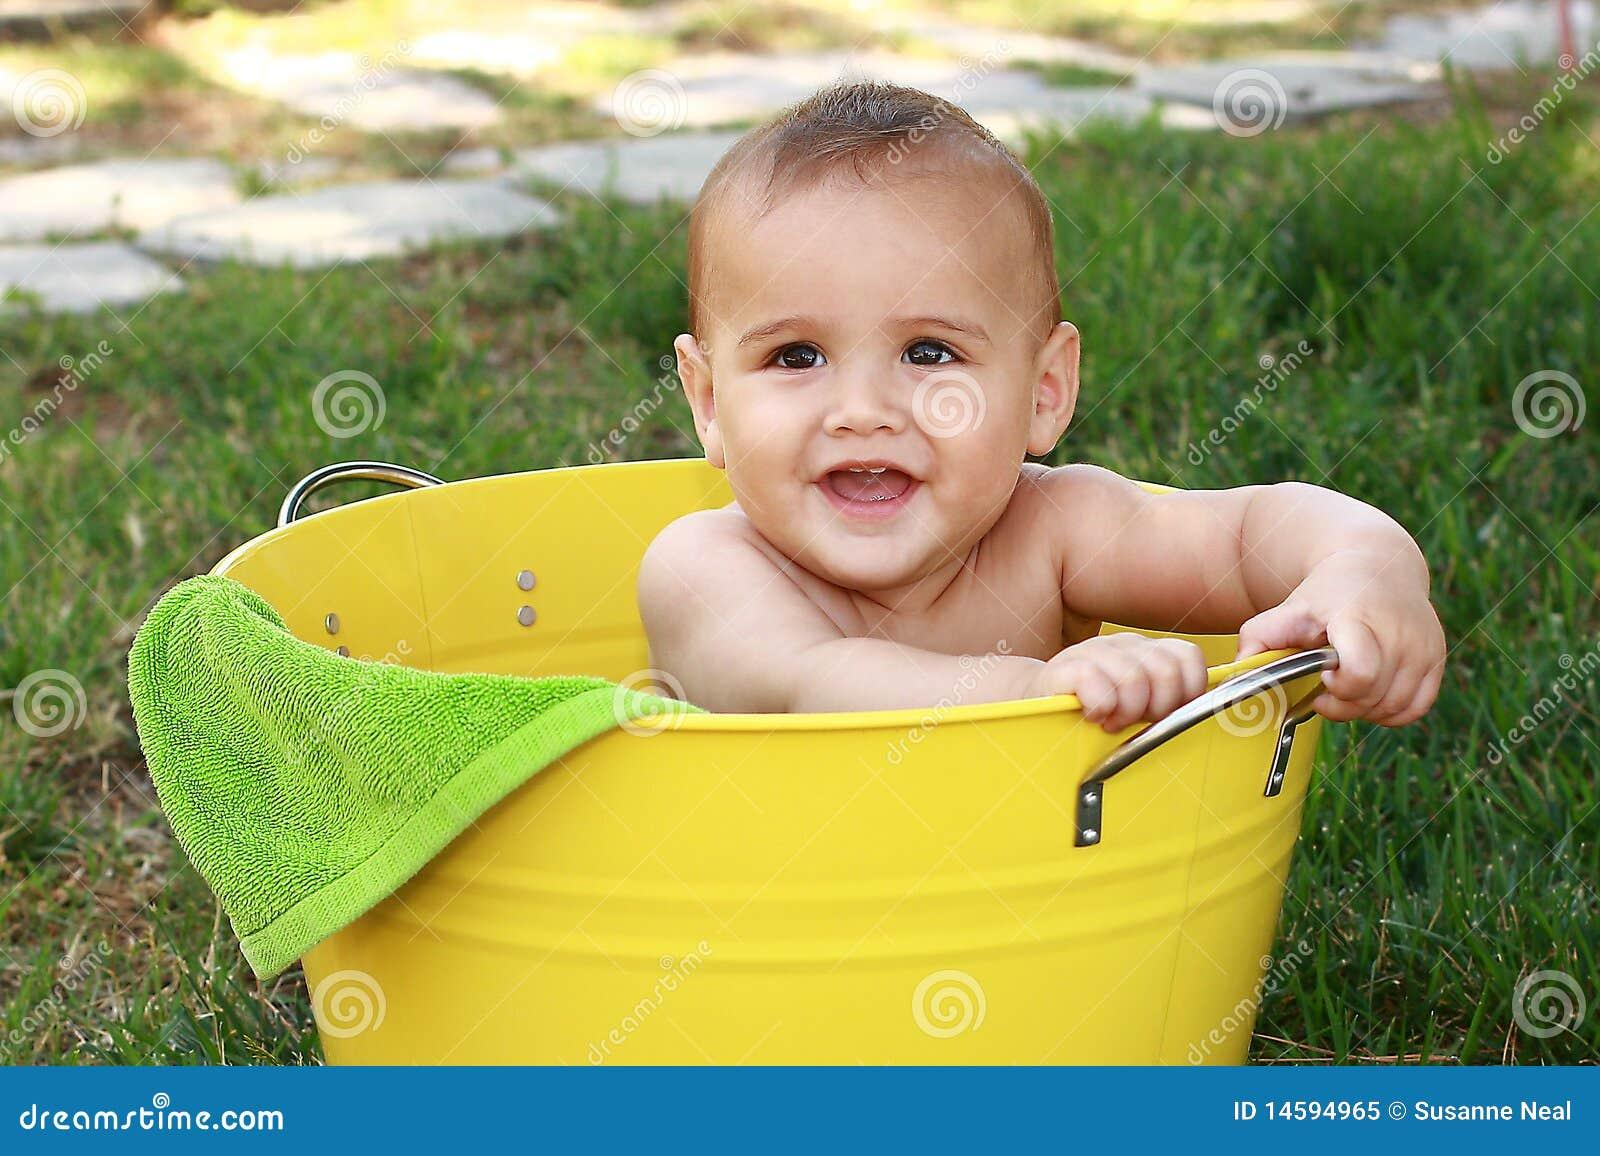 Bambino in benna gialla in giardino